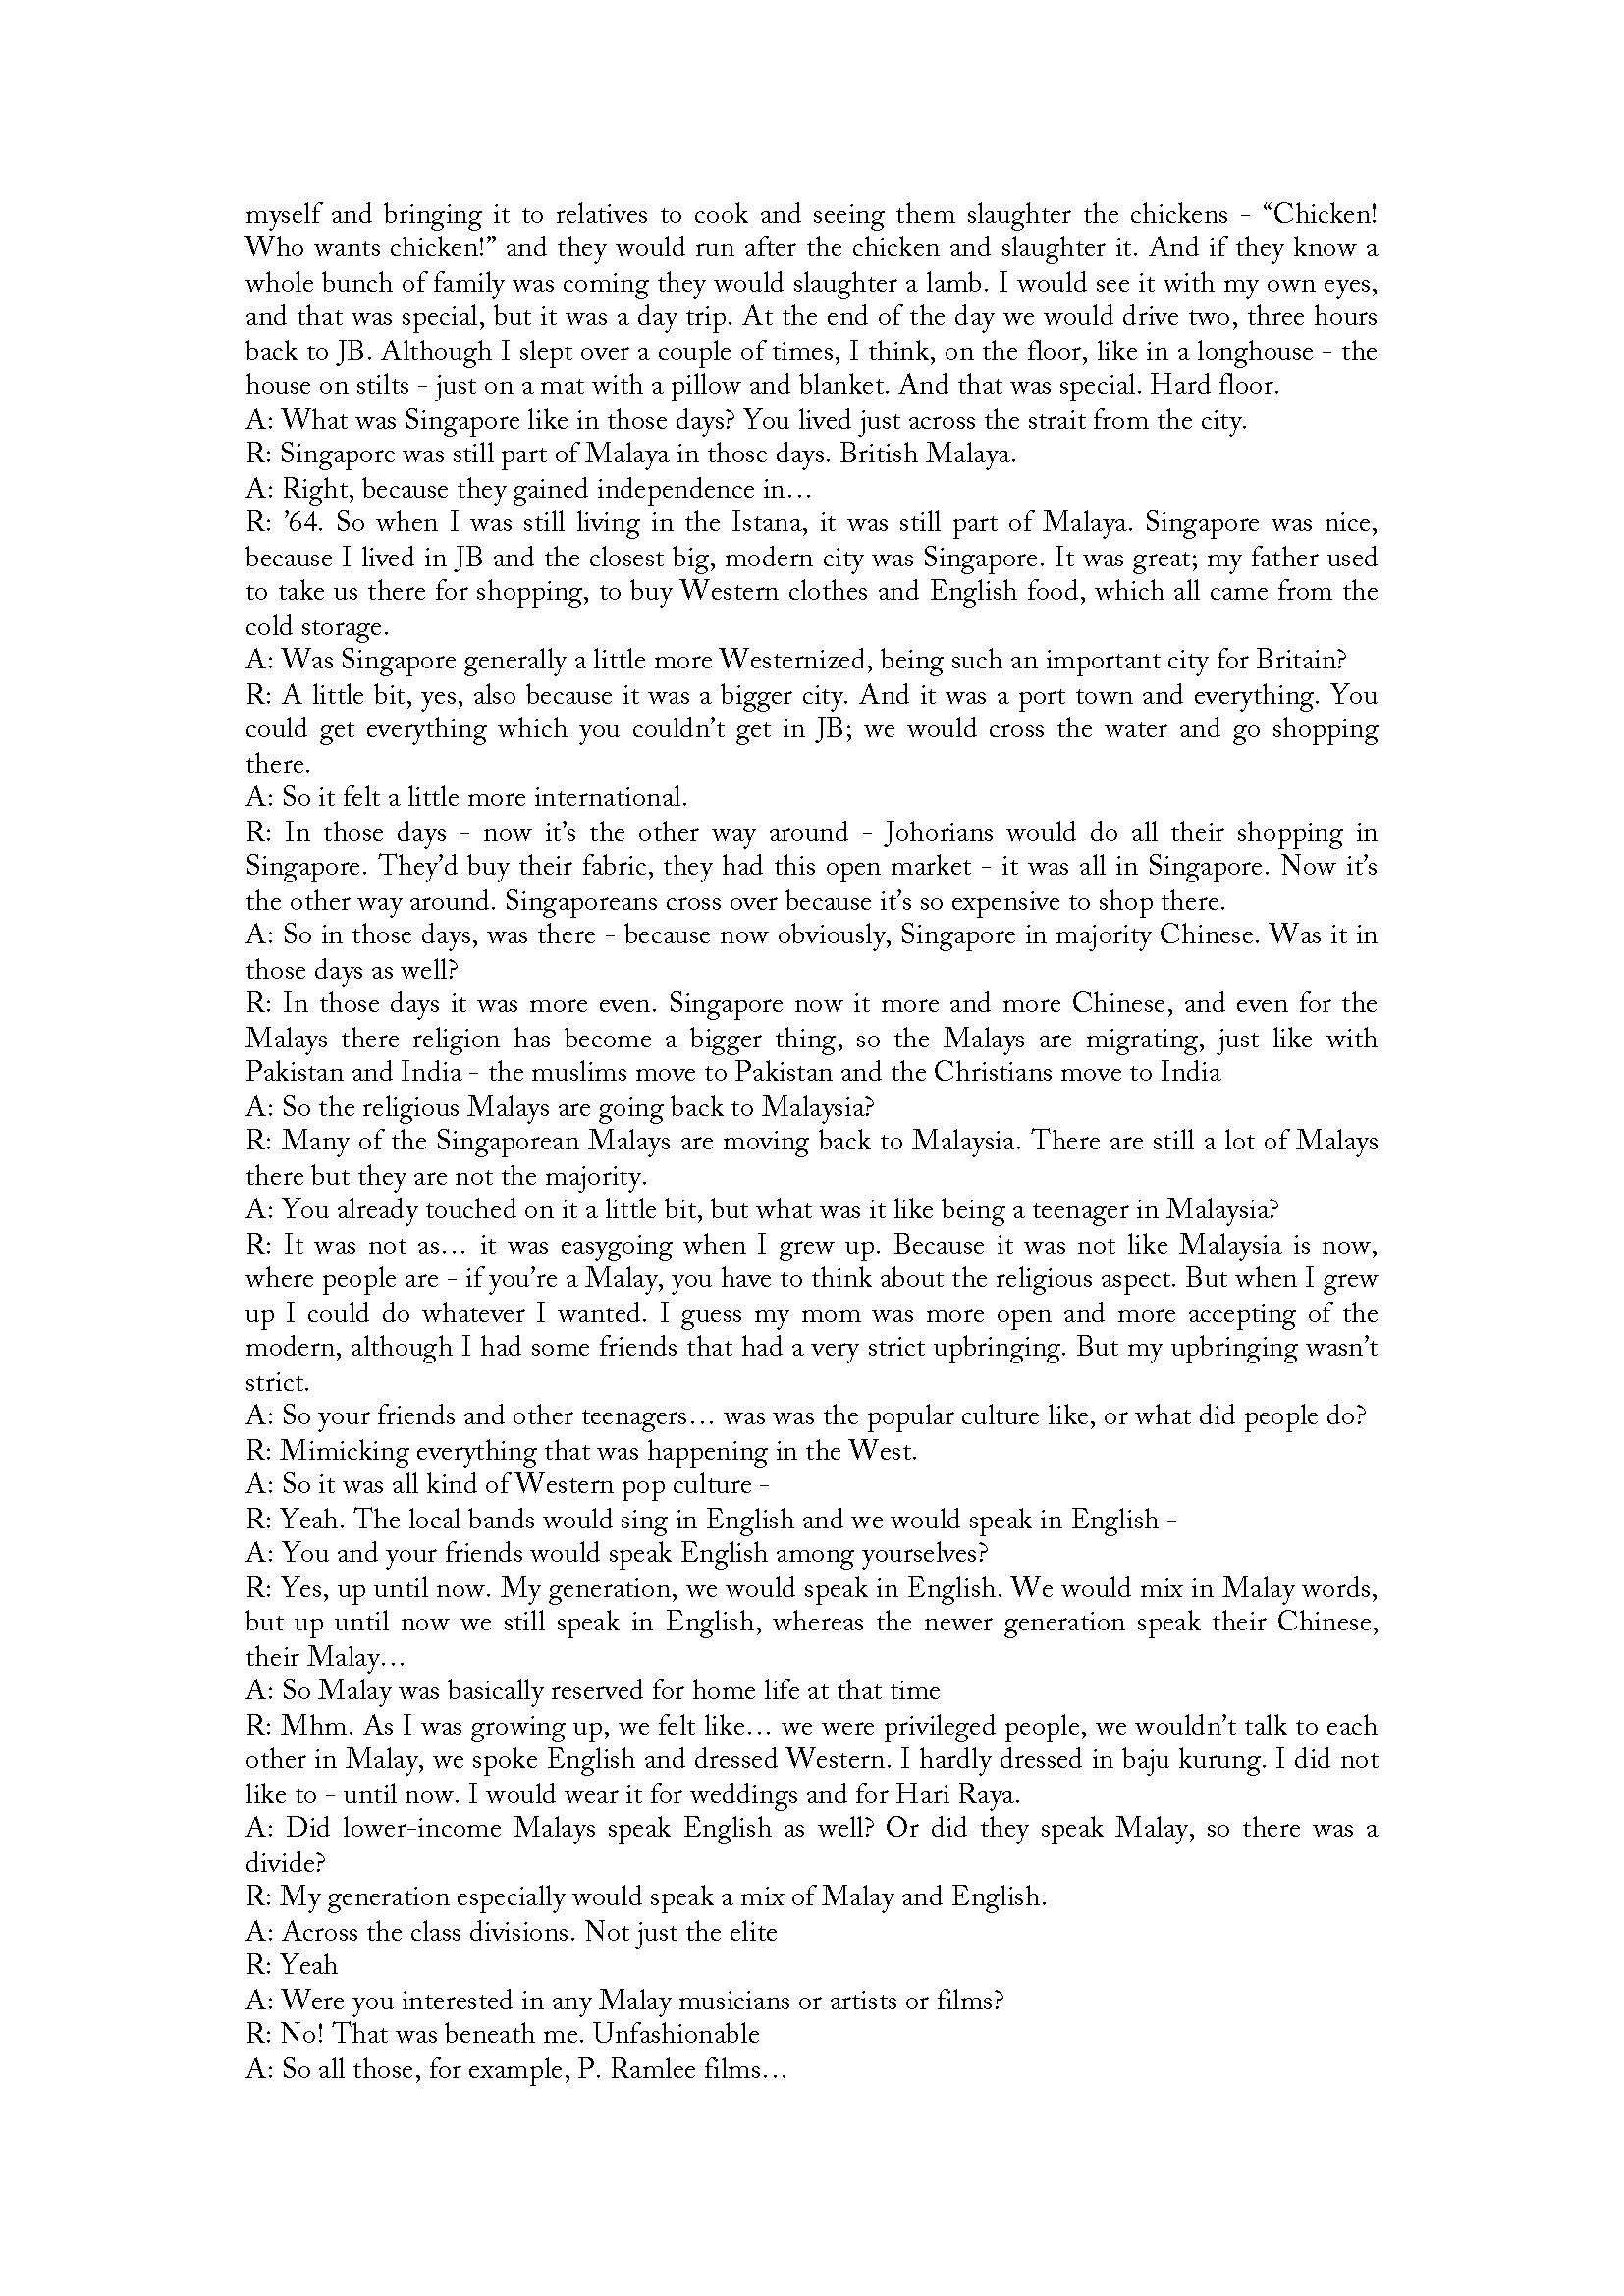 dissertationAppendix_Page_05-min_1654